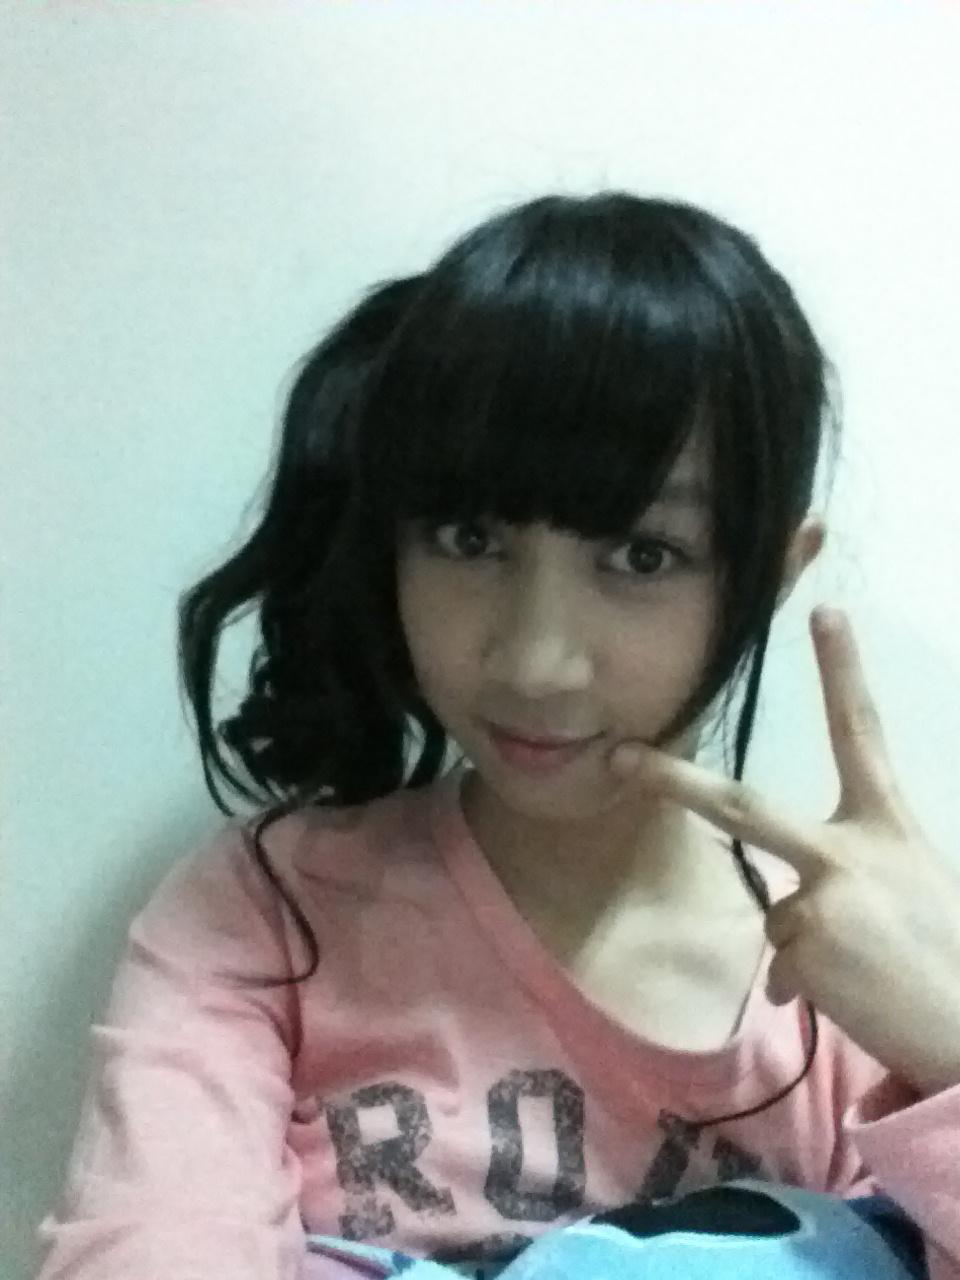 achanjkt48 0j Achan JKT48 Biodata Profil Foto Ayana Shahab Achan JKT48